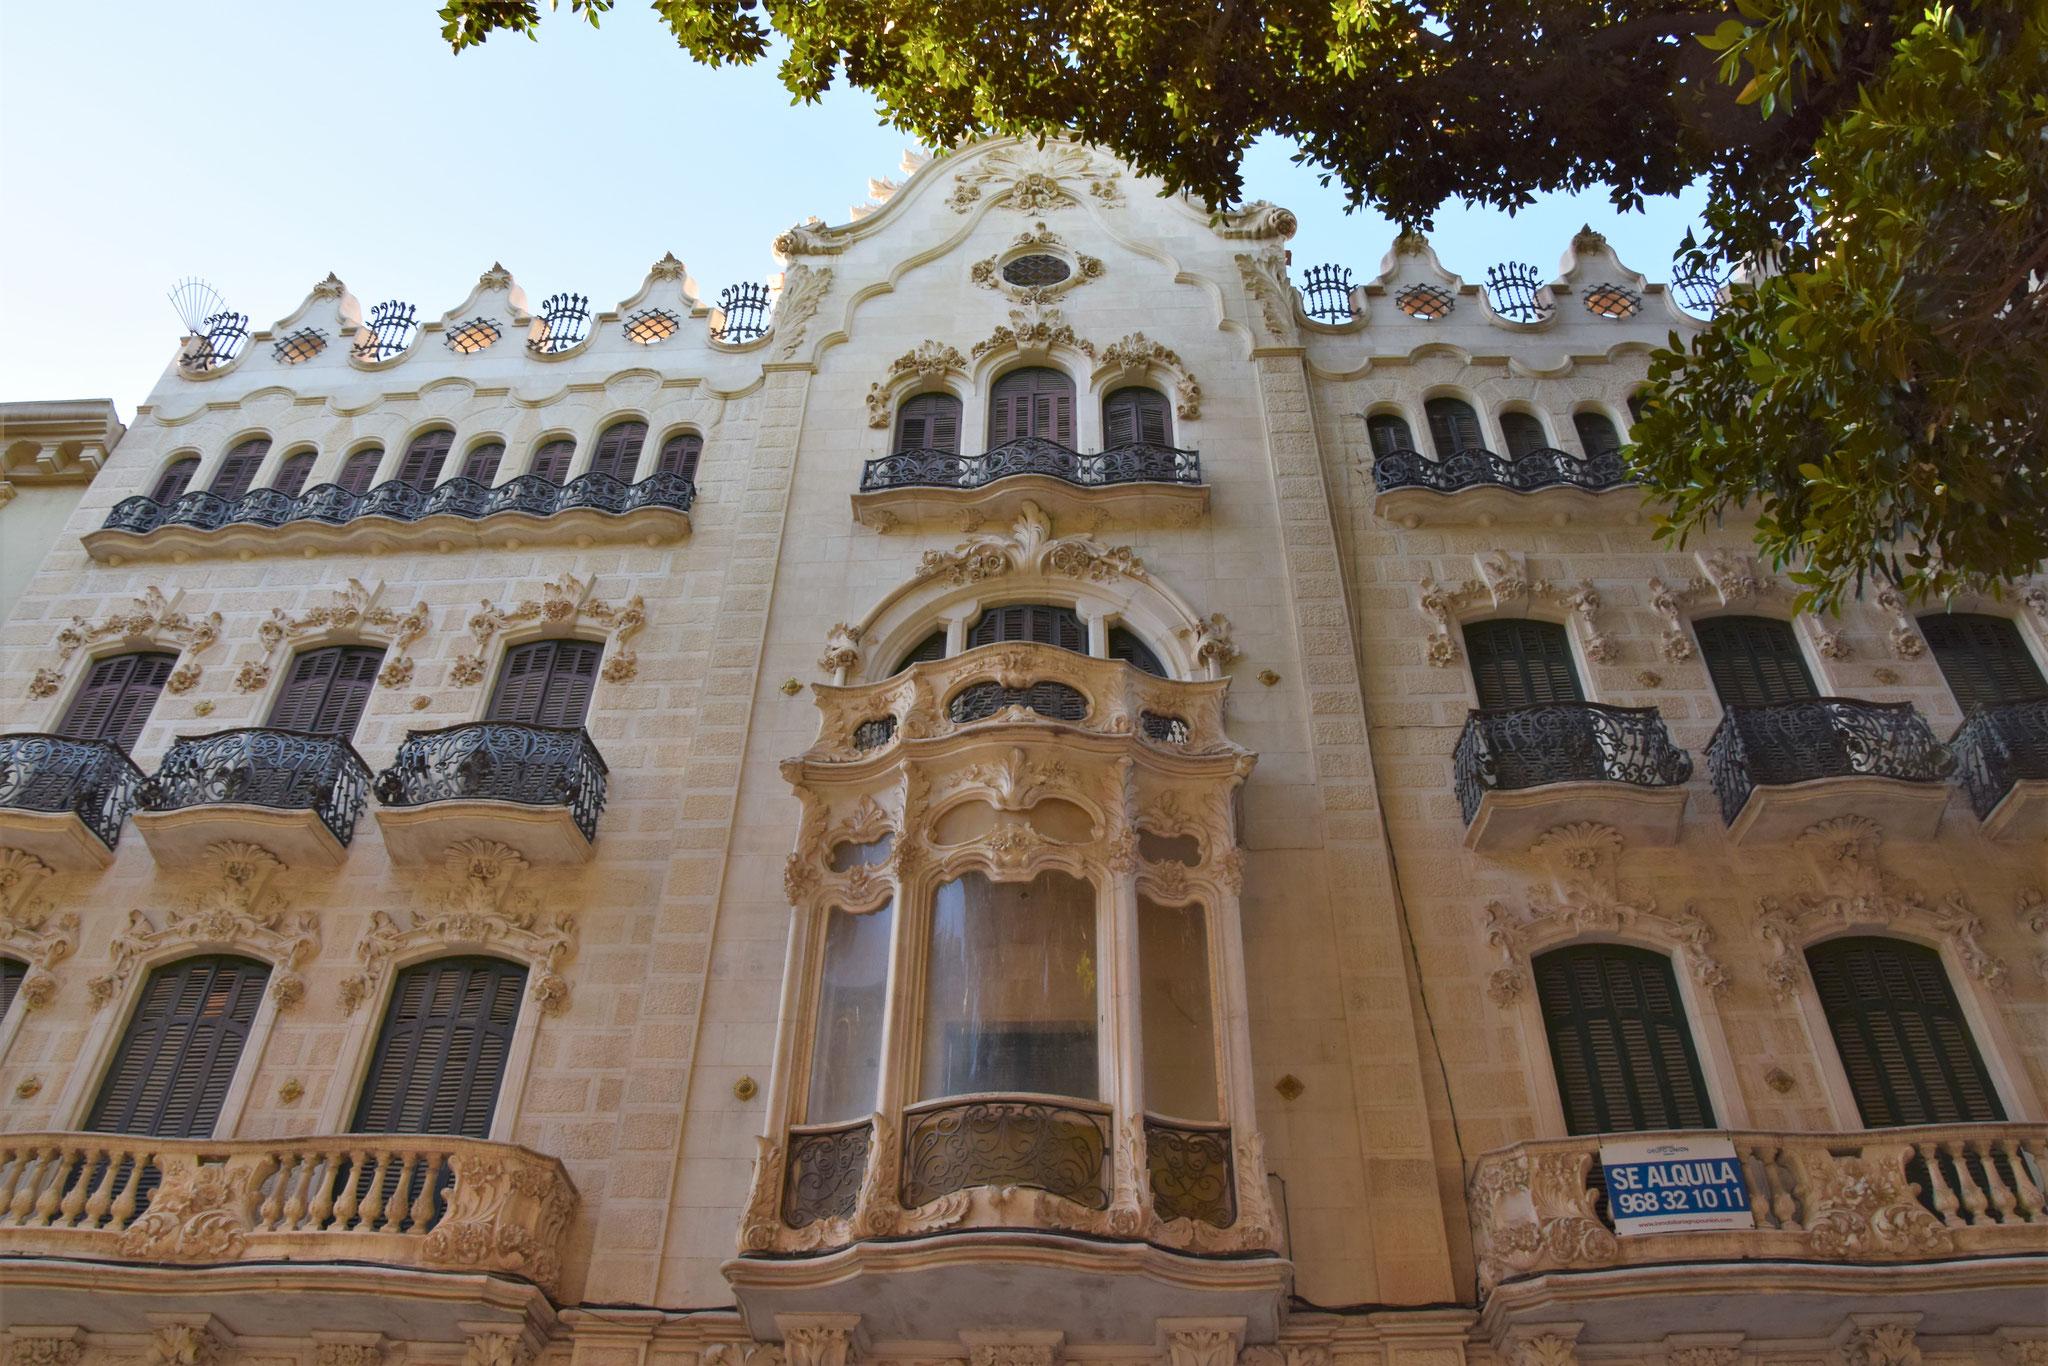 Casa Maestre - inspiriert vom Gaudí-Stil